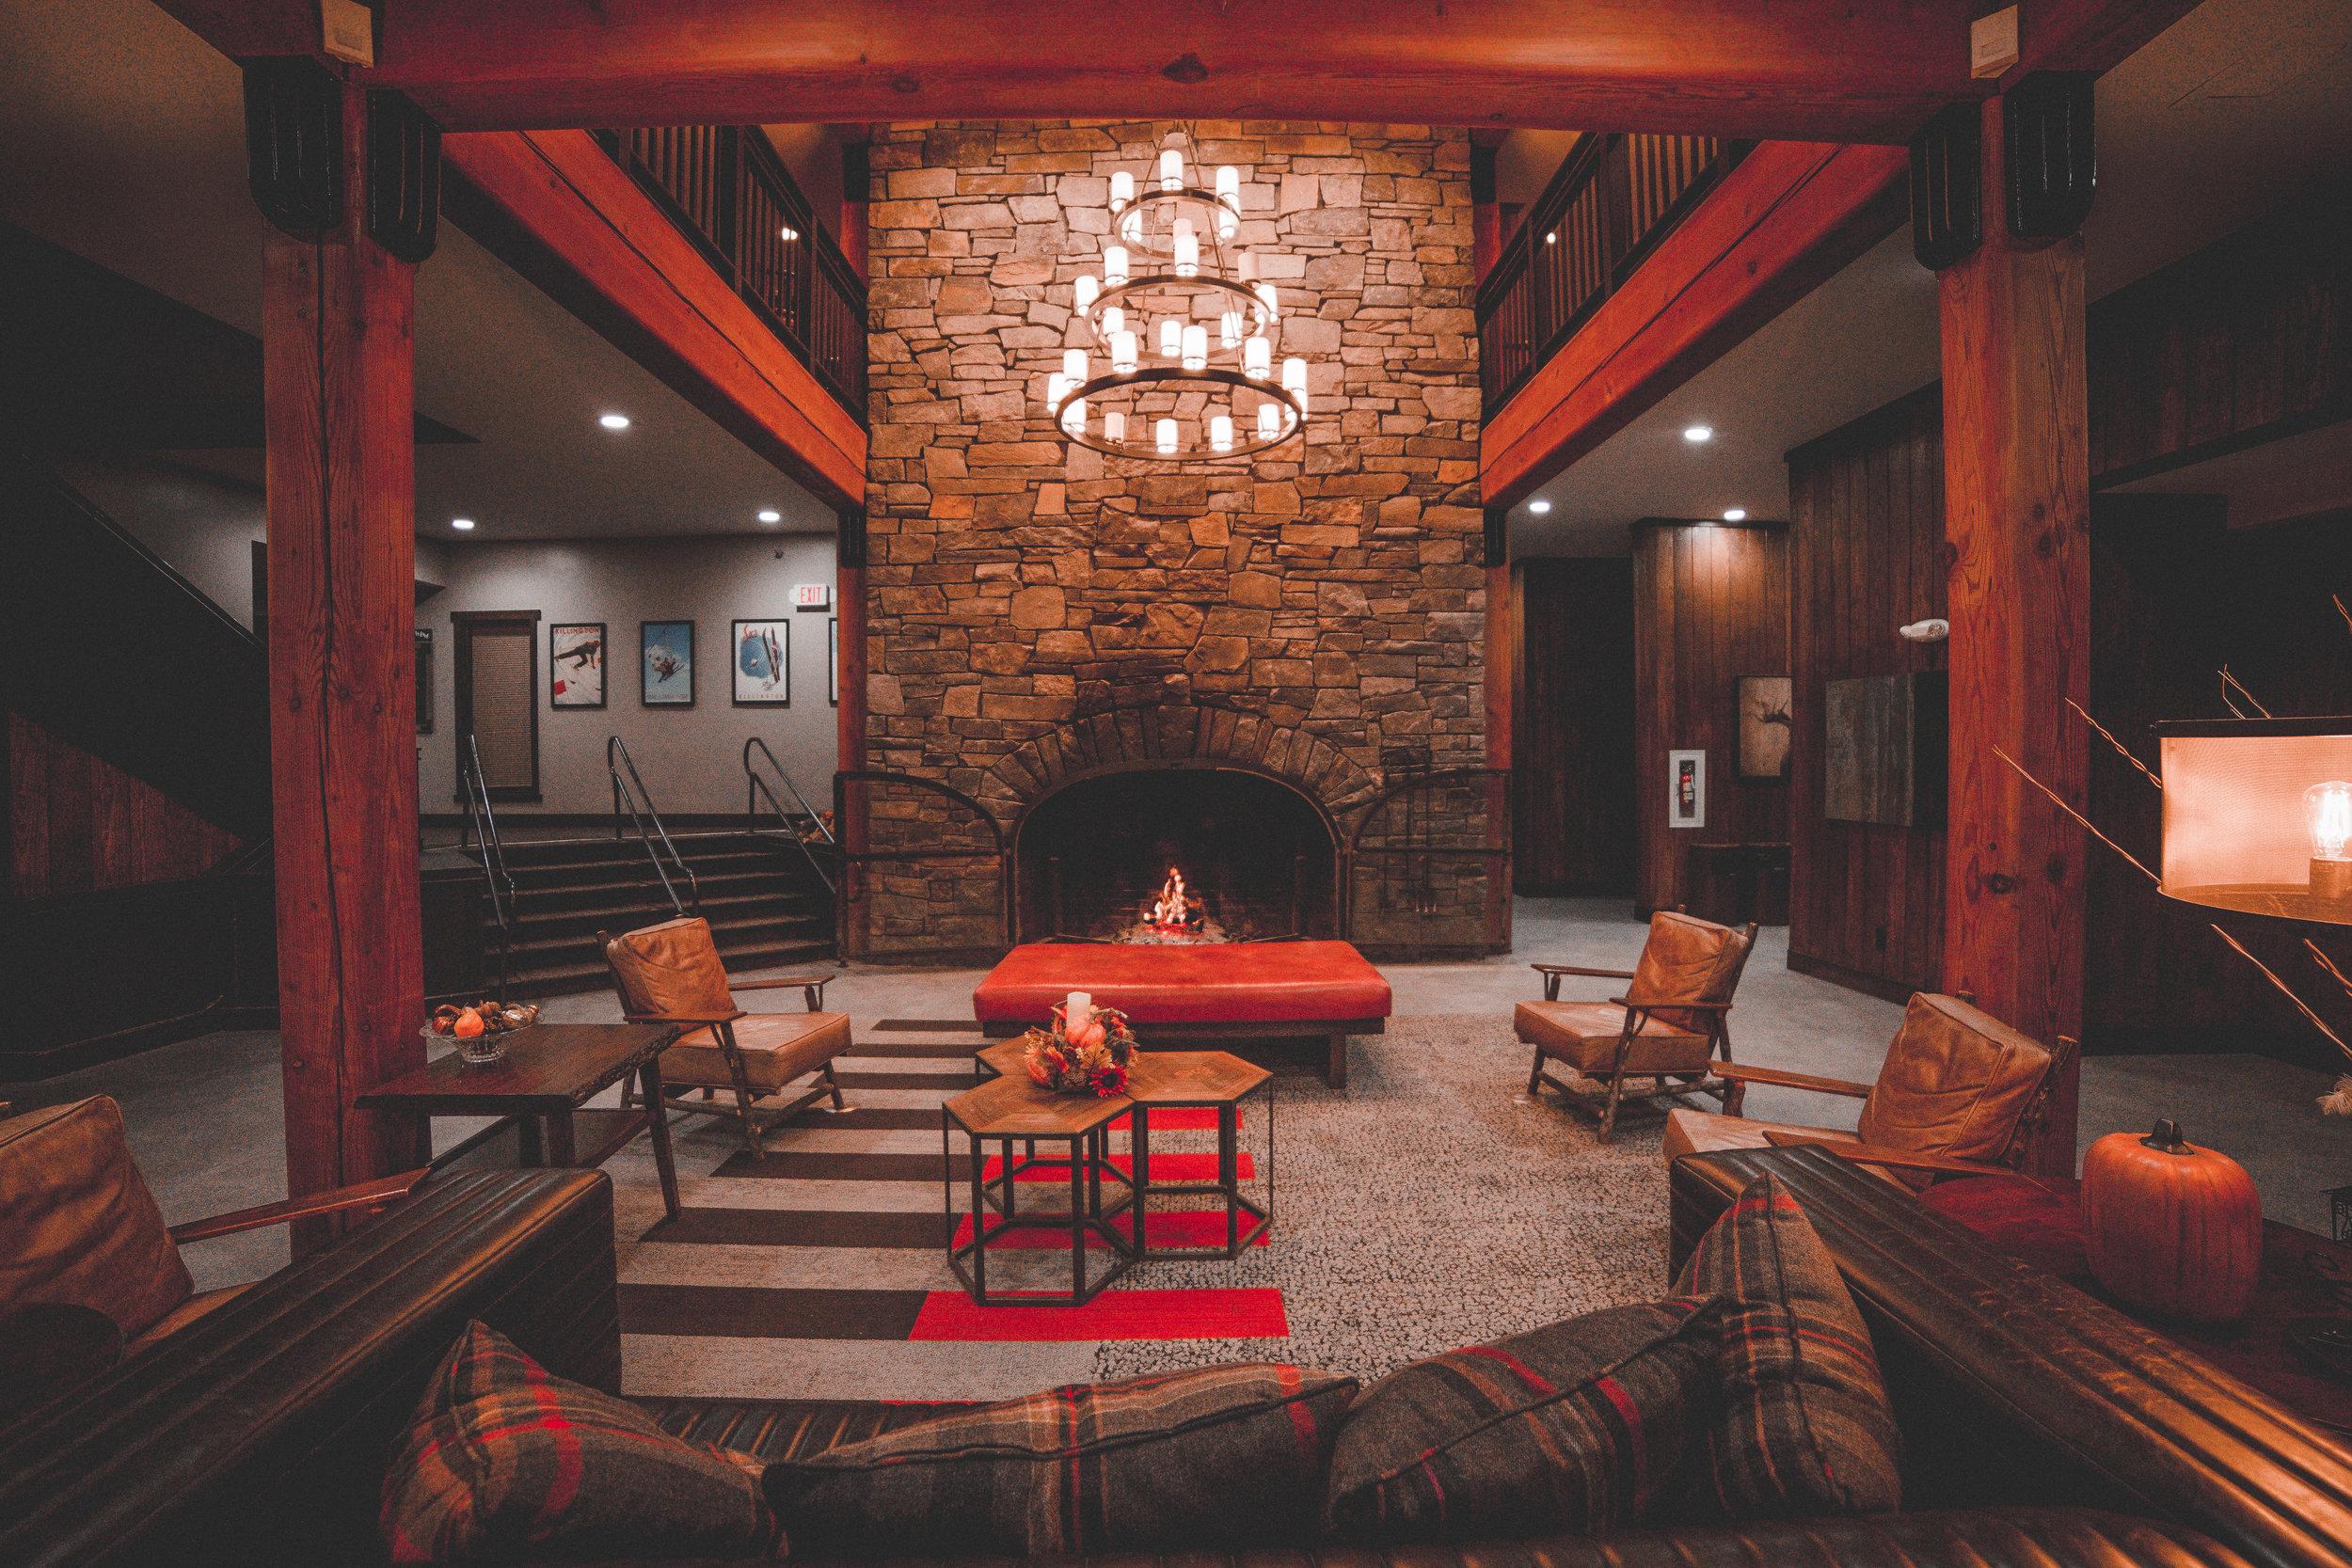 Killington Mountain Lodge - #exposedadventure 2018 campaign